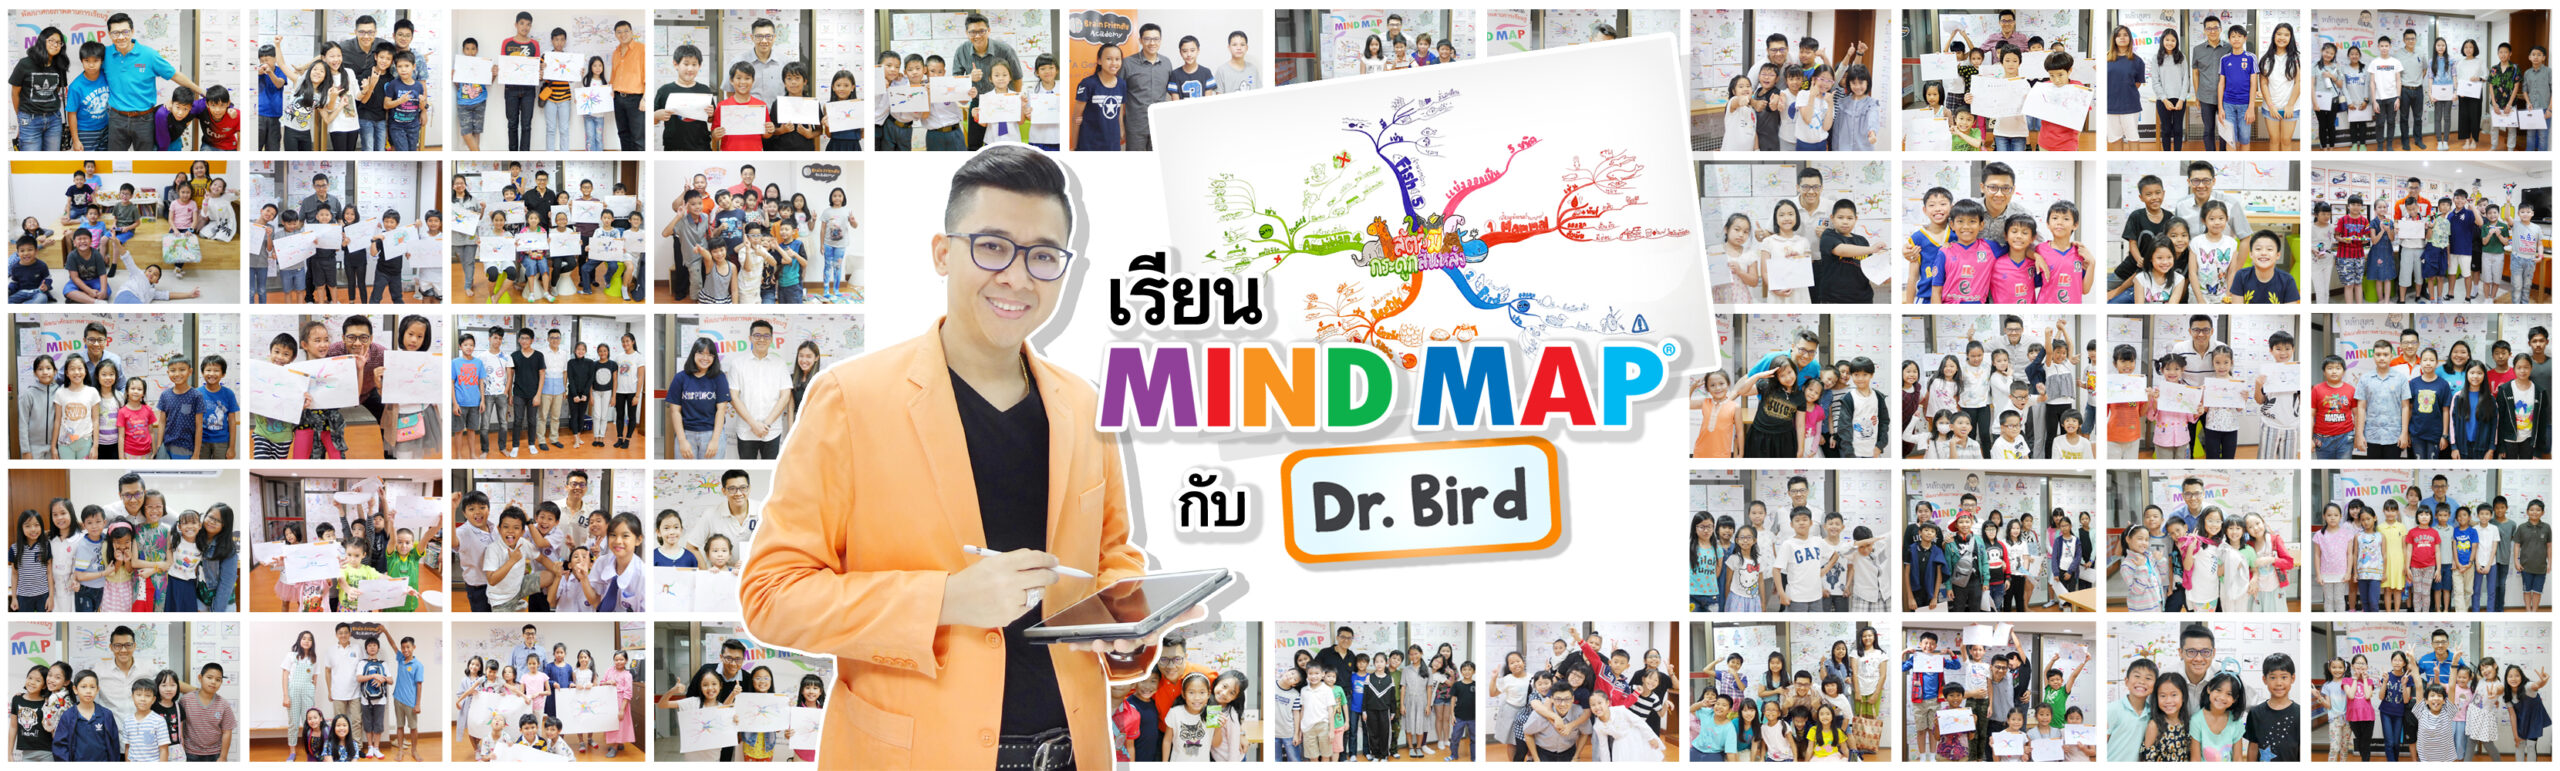 MINDMAP แบบ BrainFriendly สอนโดย อาจารย์ ดร.เบิร์ด